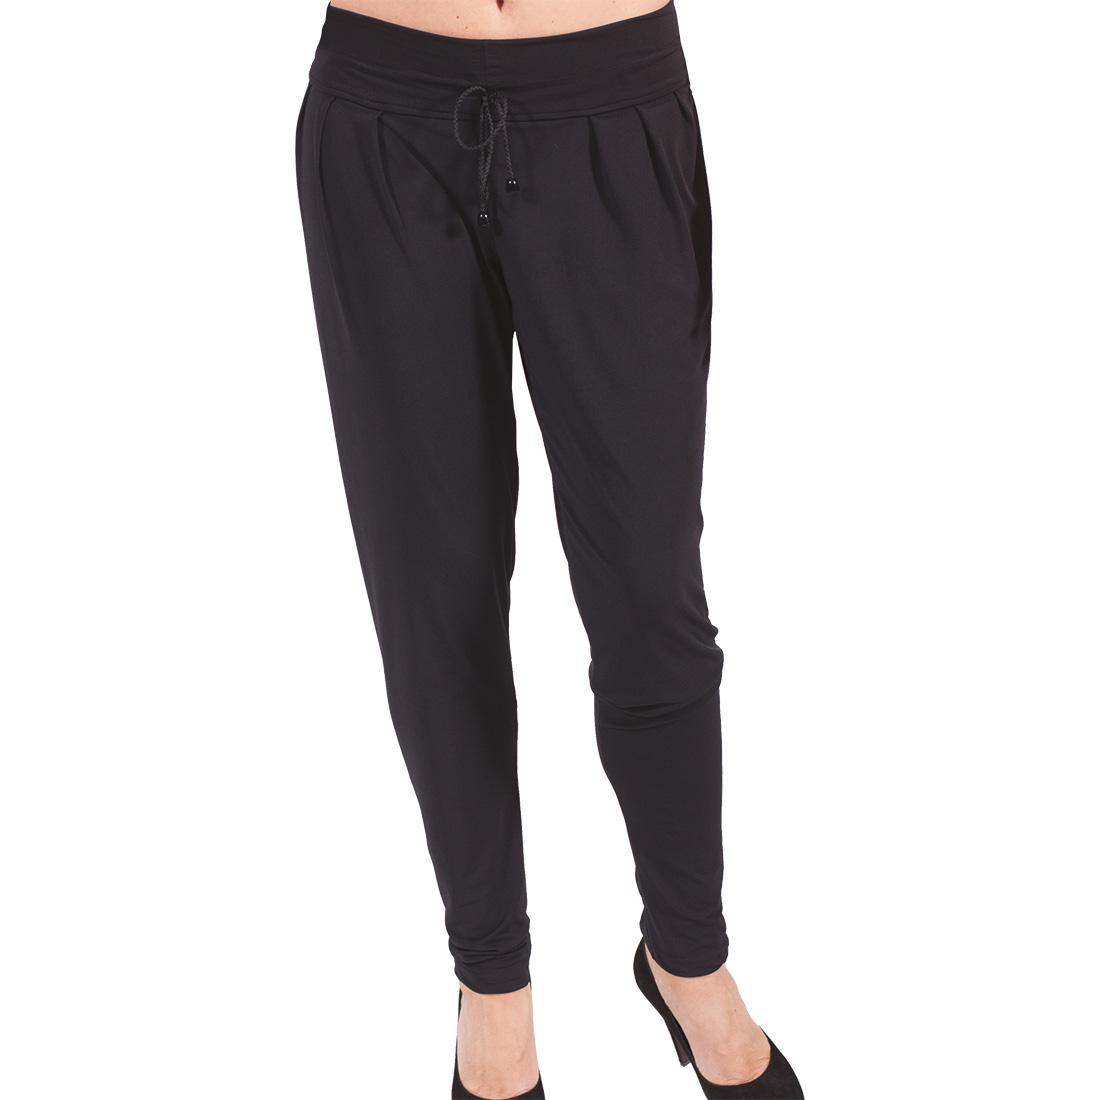 pantalone-maele-donna